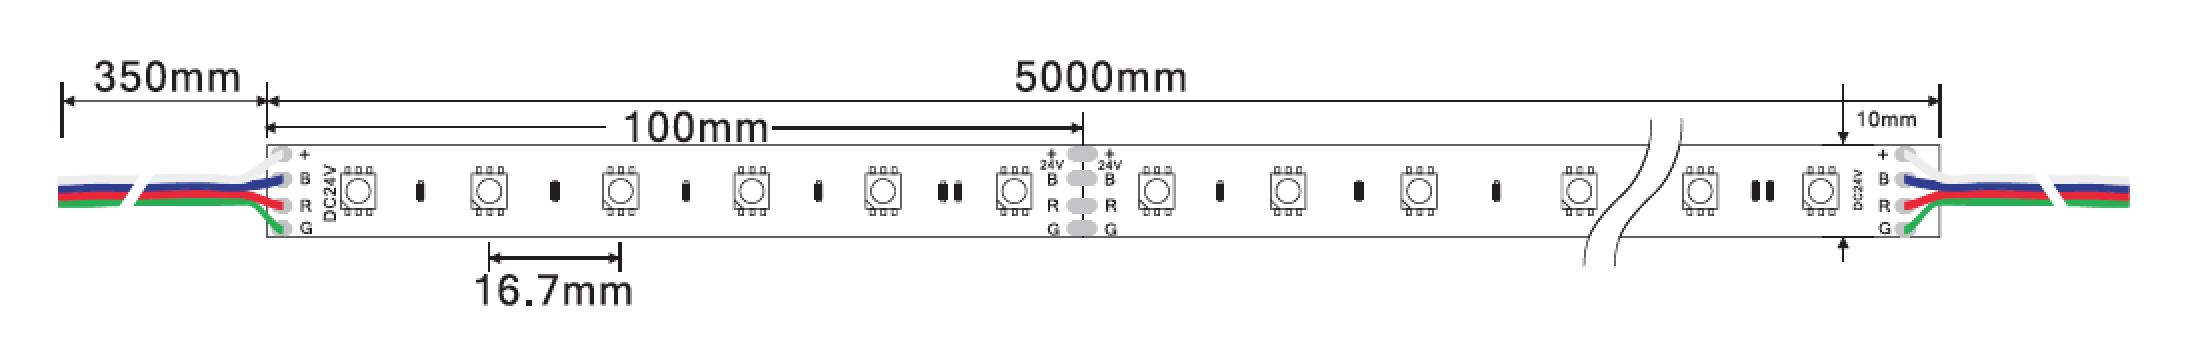 TLT-LX-175030 line drawing